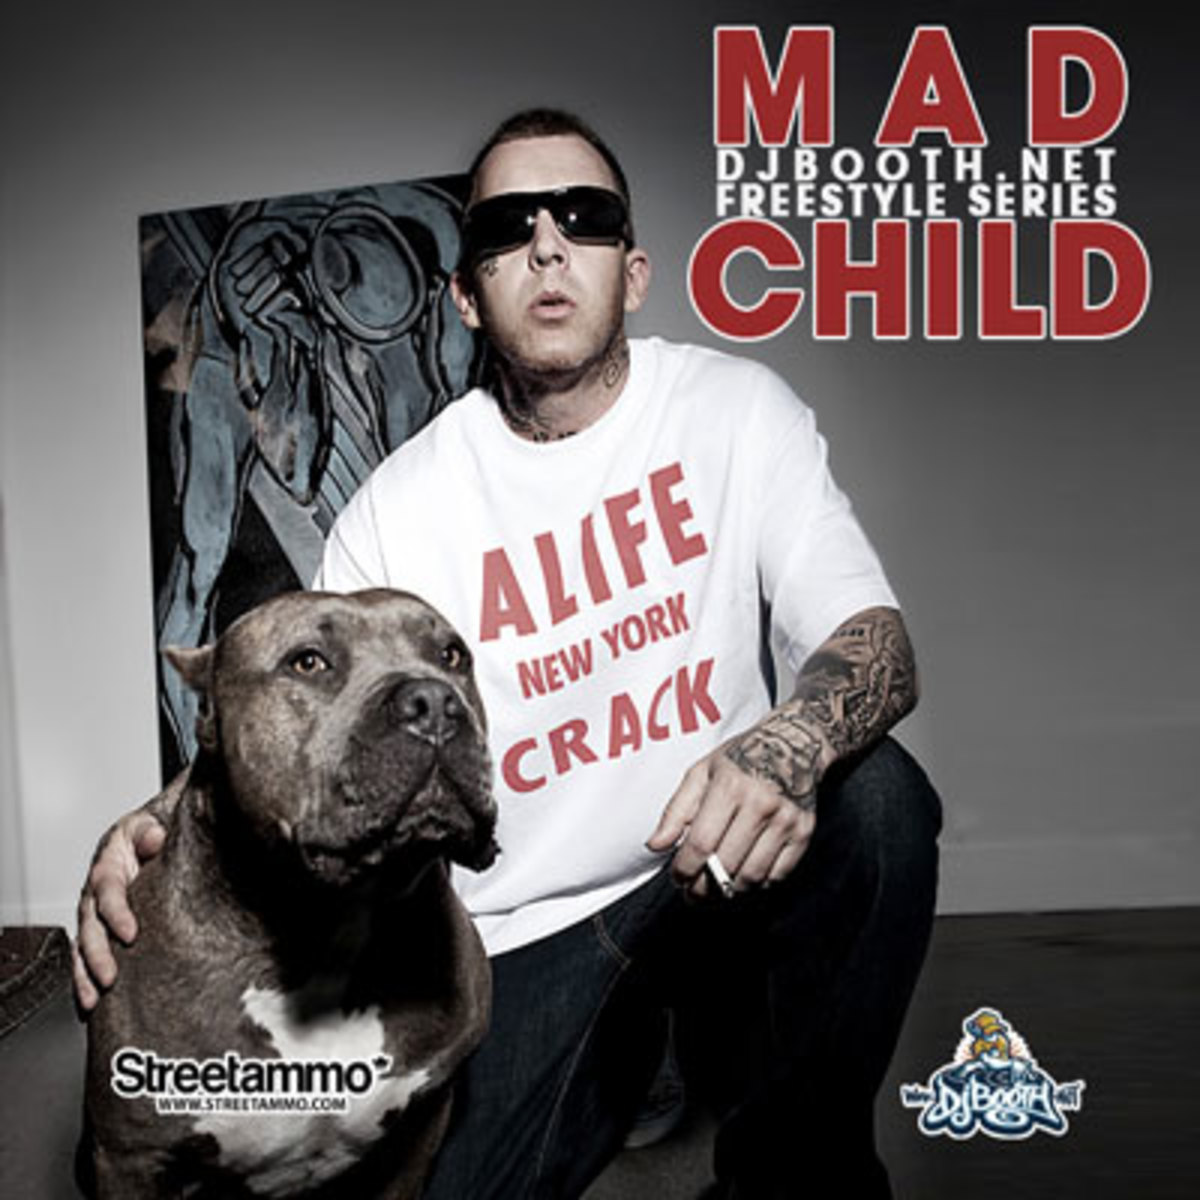 madchild-free.jpg